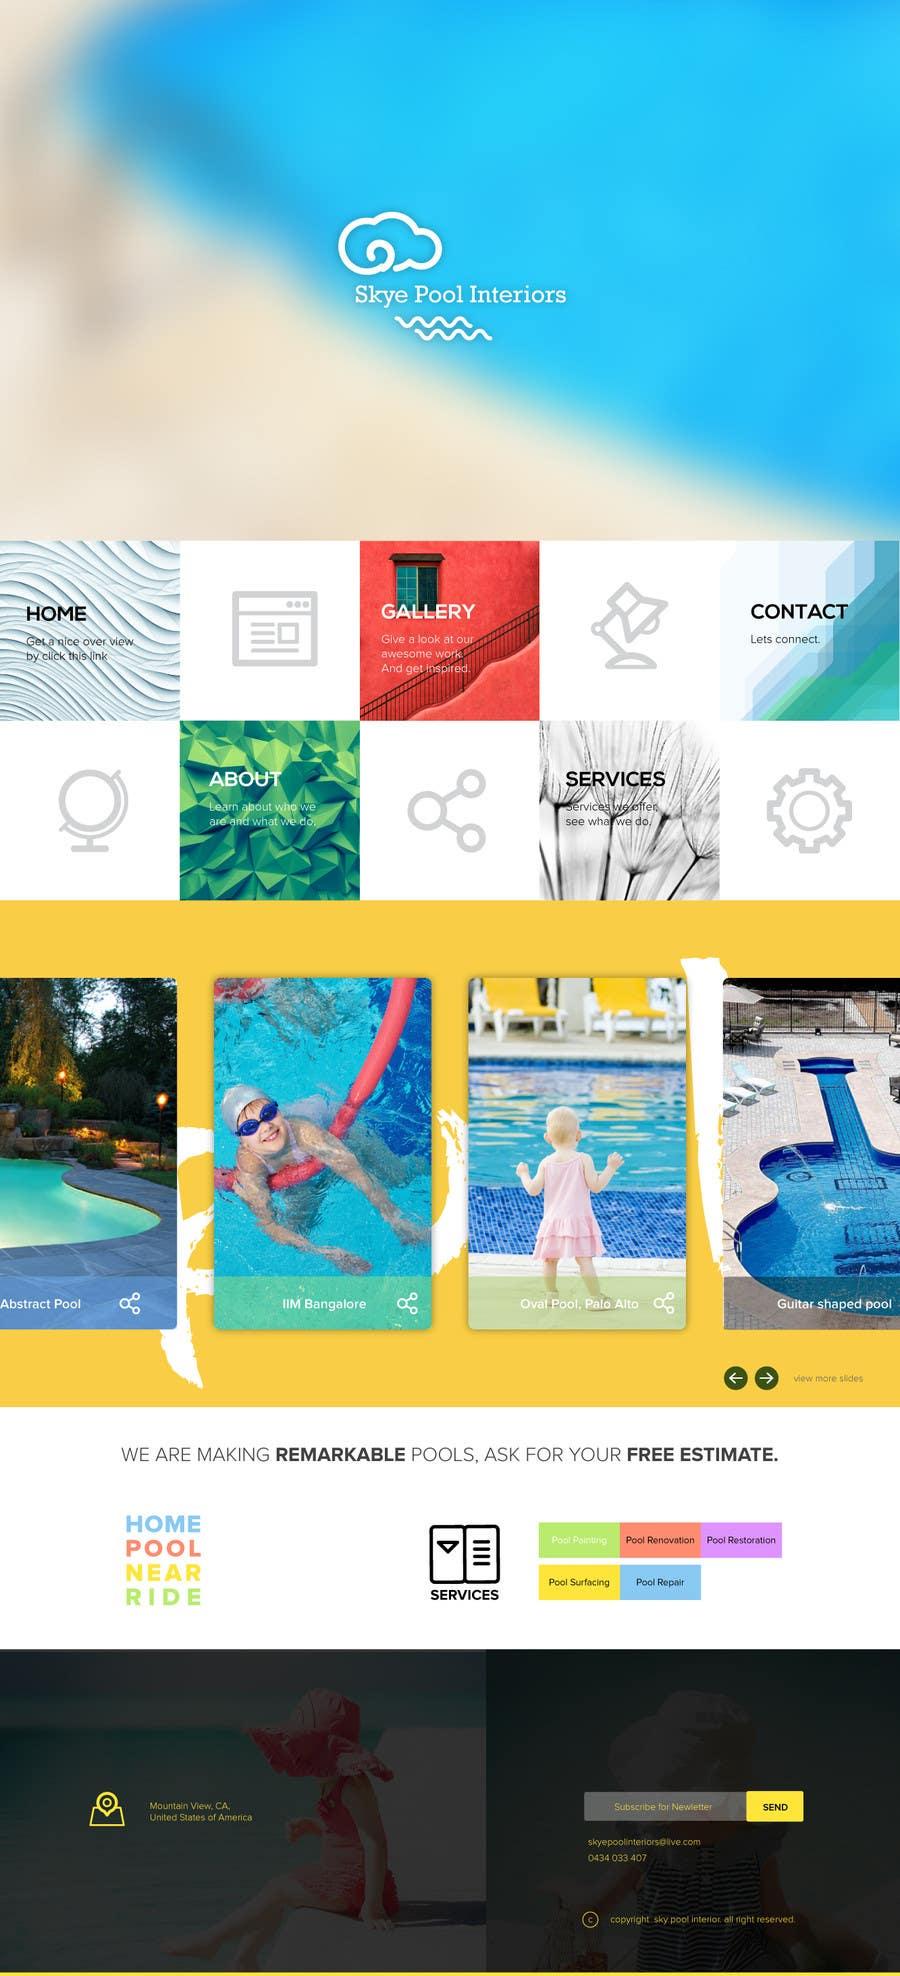 Bài tham dự cuộc thi #                                        21                                      cho                                         Design a Website Mockup/Including Logo for Pool Renovation company